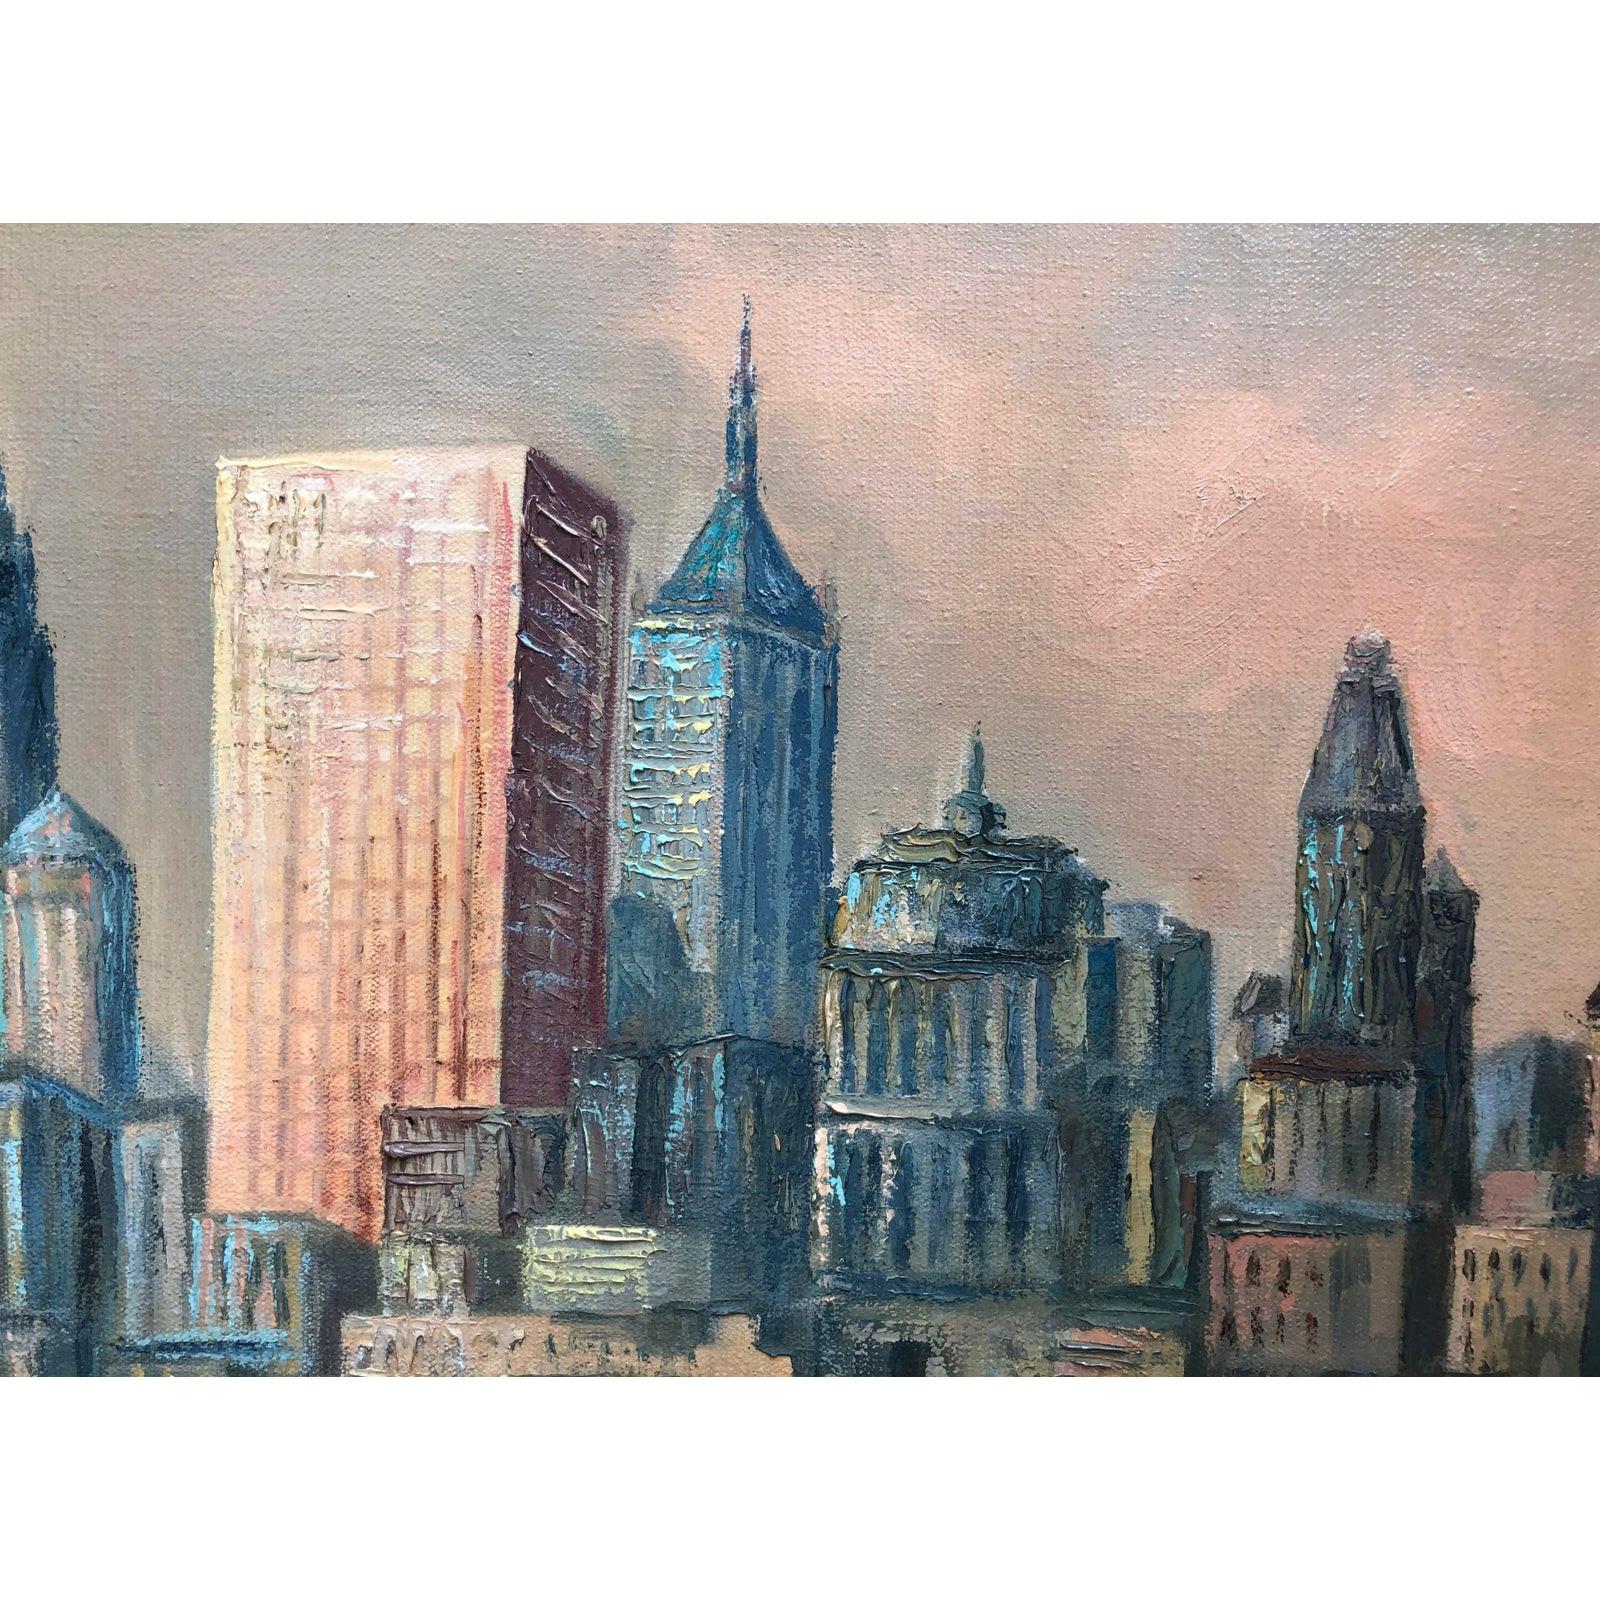 1950's Mid Century Cityscape Painting on Oversized Canvas